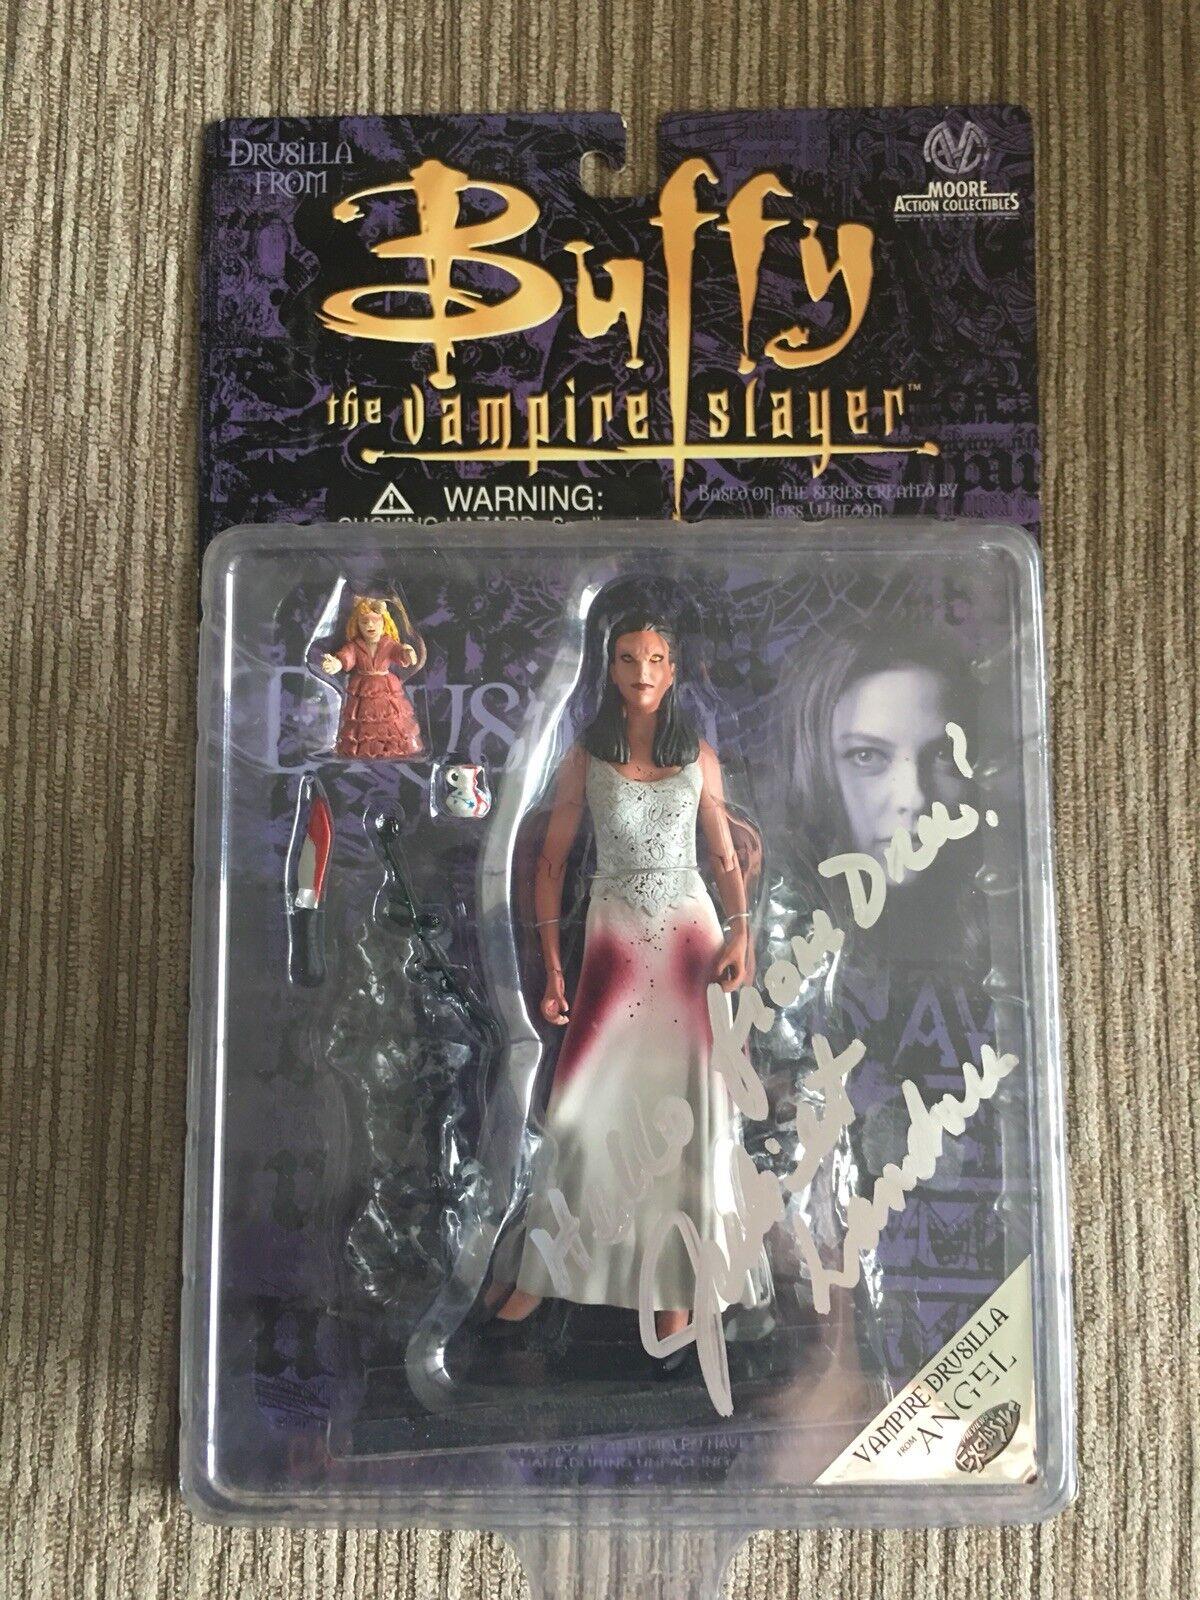 El asesino vampiro Buffy, el vampiro raro drussi Lamar, la firma de Julieta Randall.